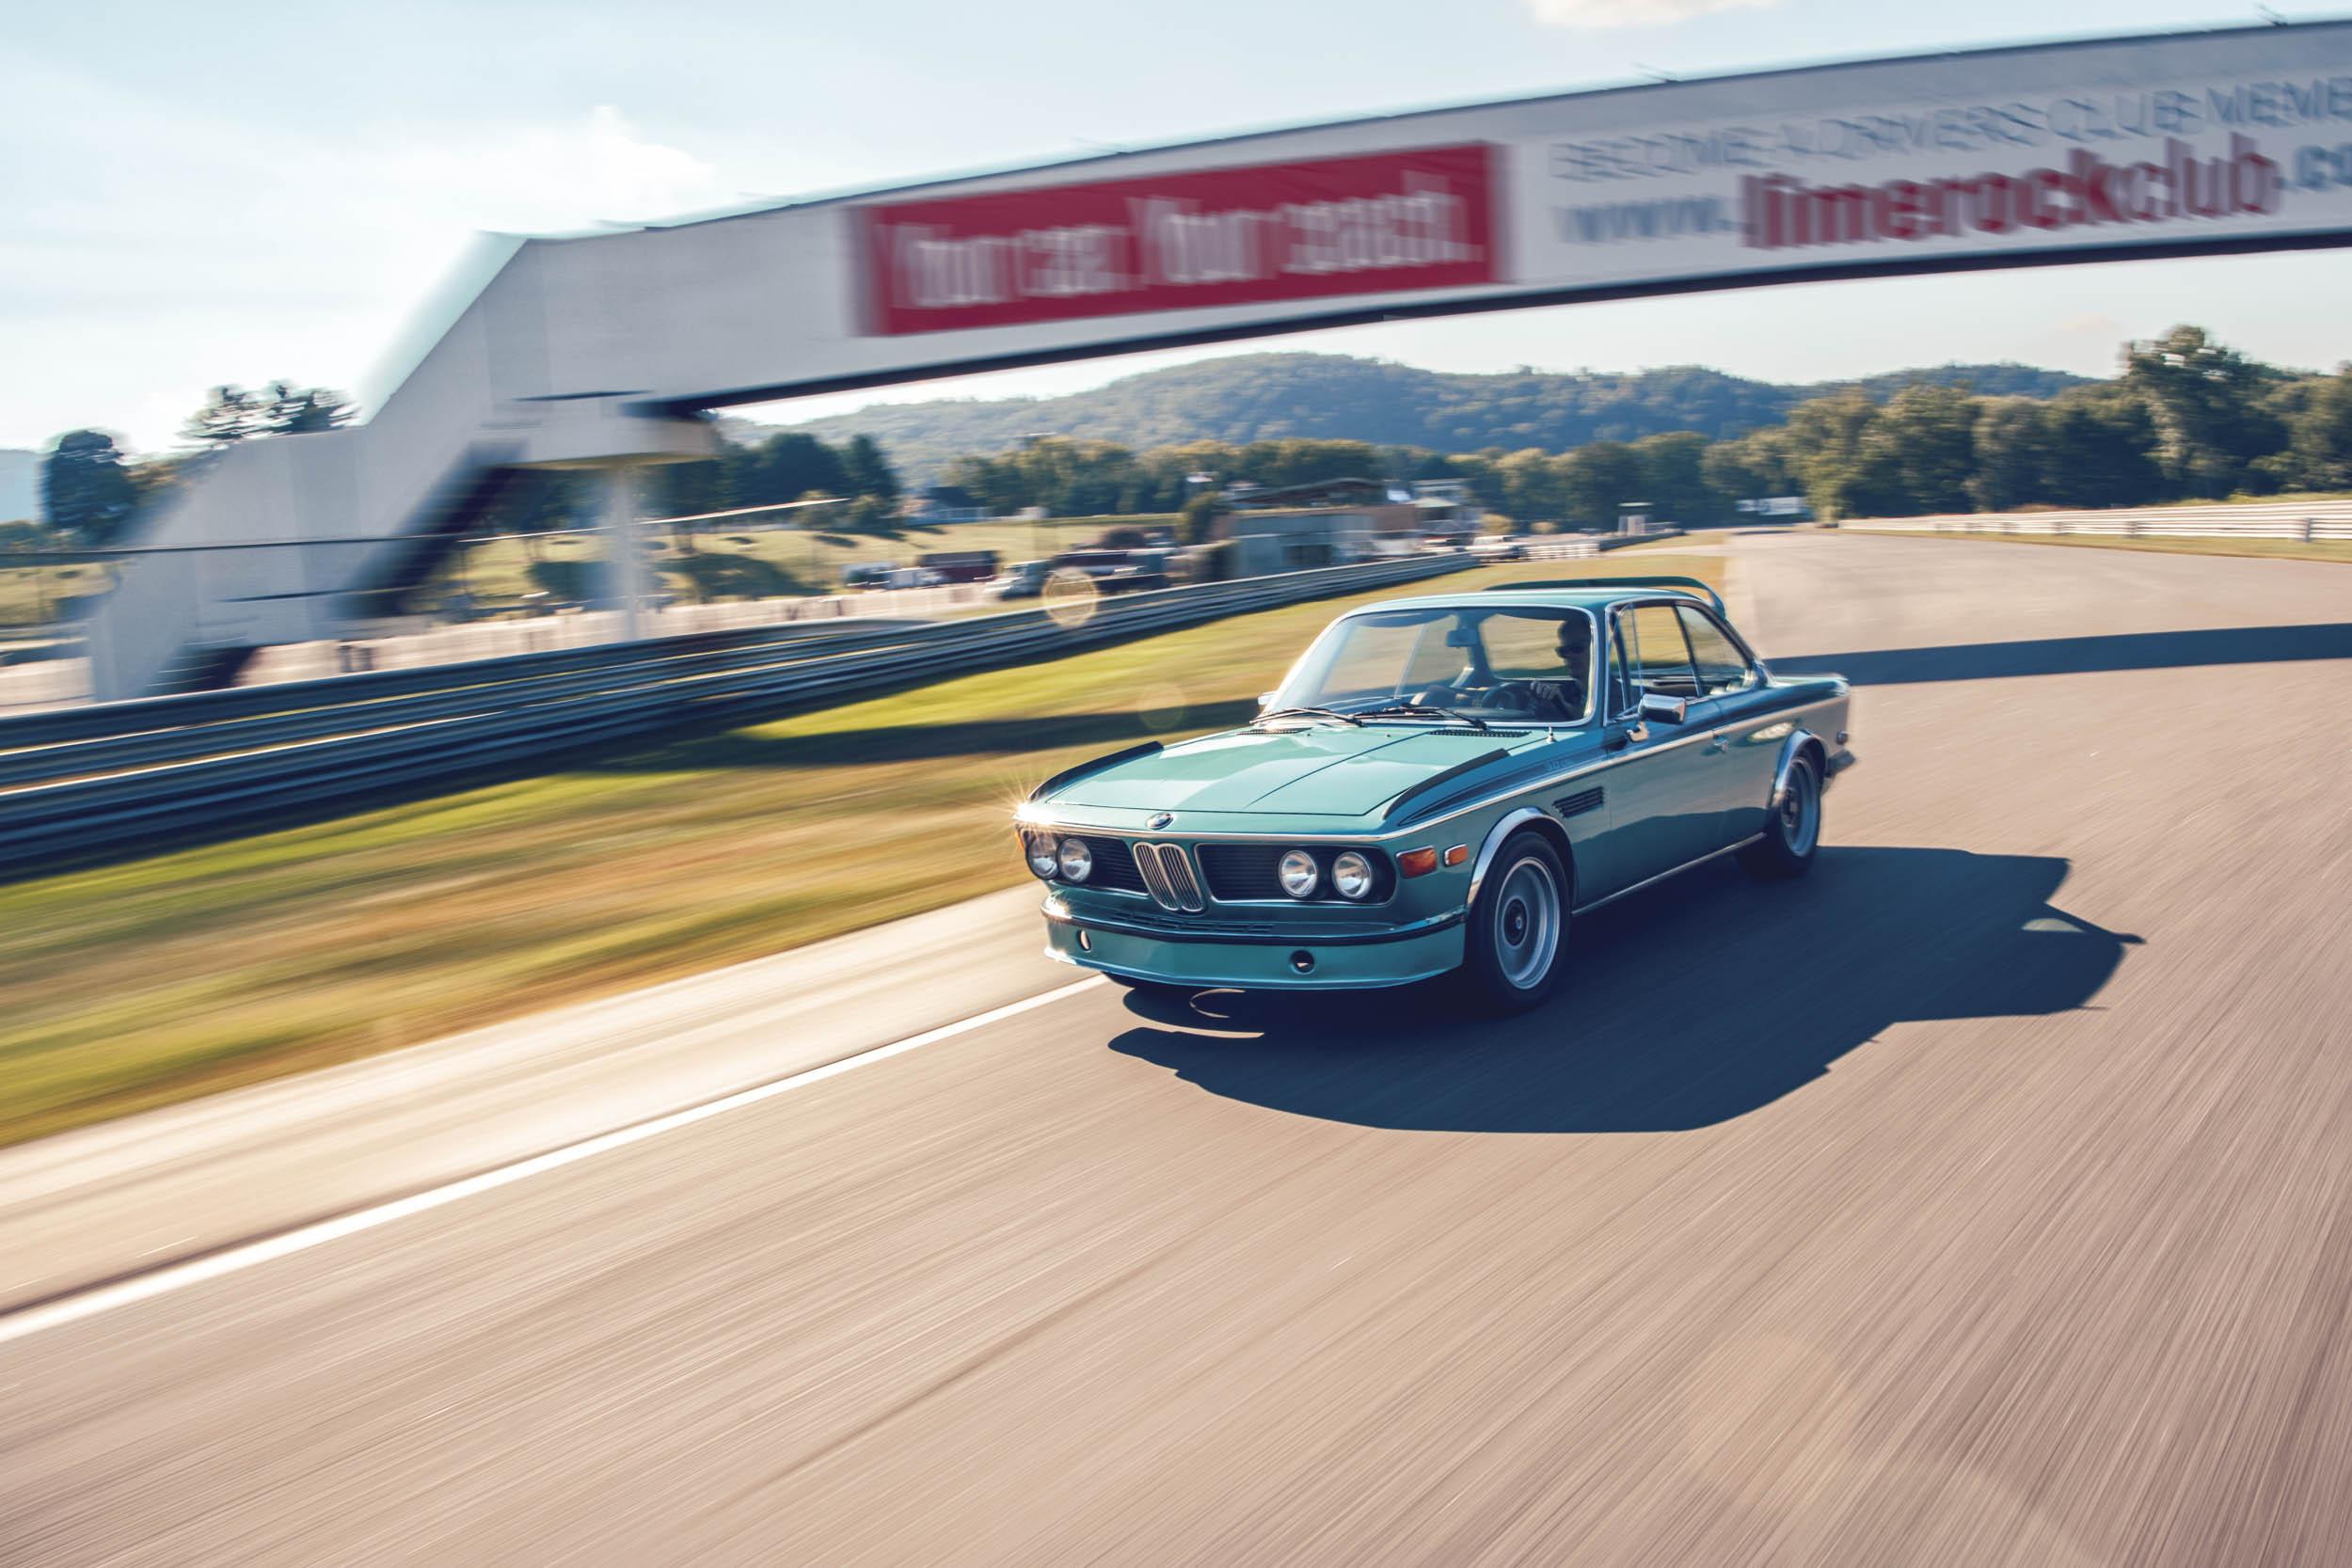 1973 BMW 3.0CSL front 3/4